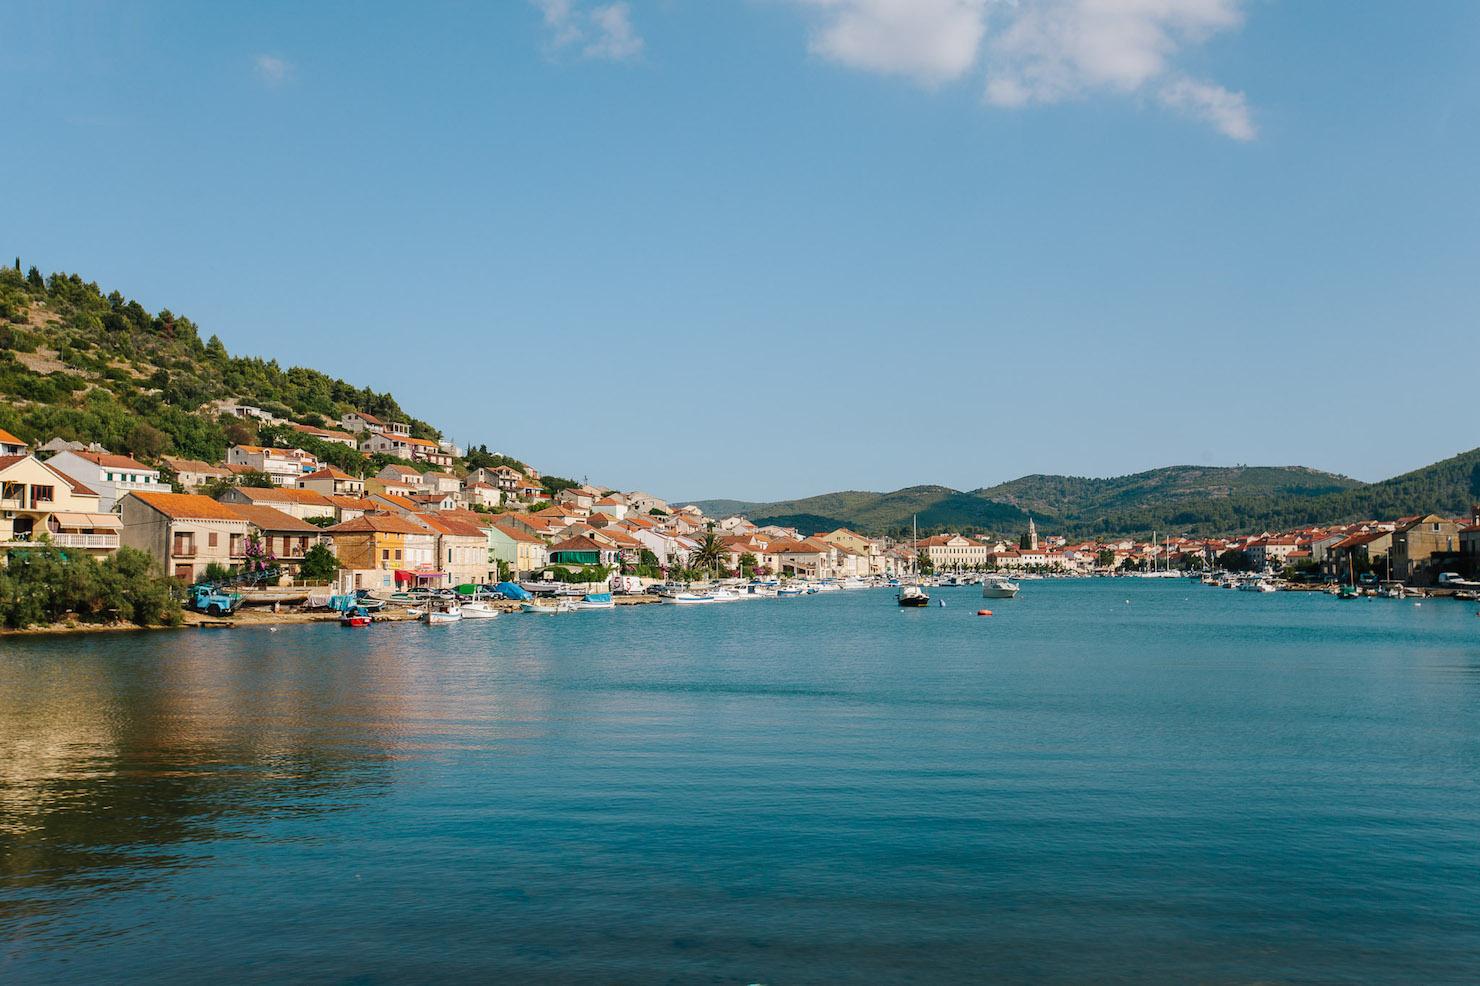 Korcula Town, Croatia with MedSailors